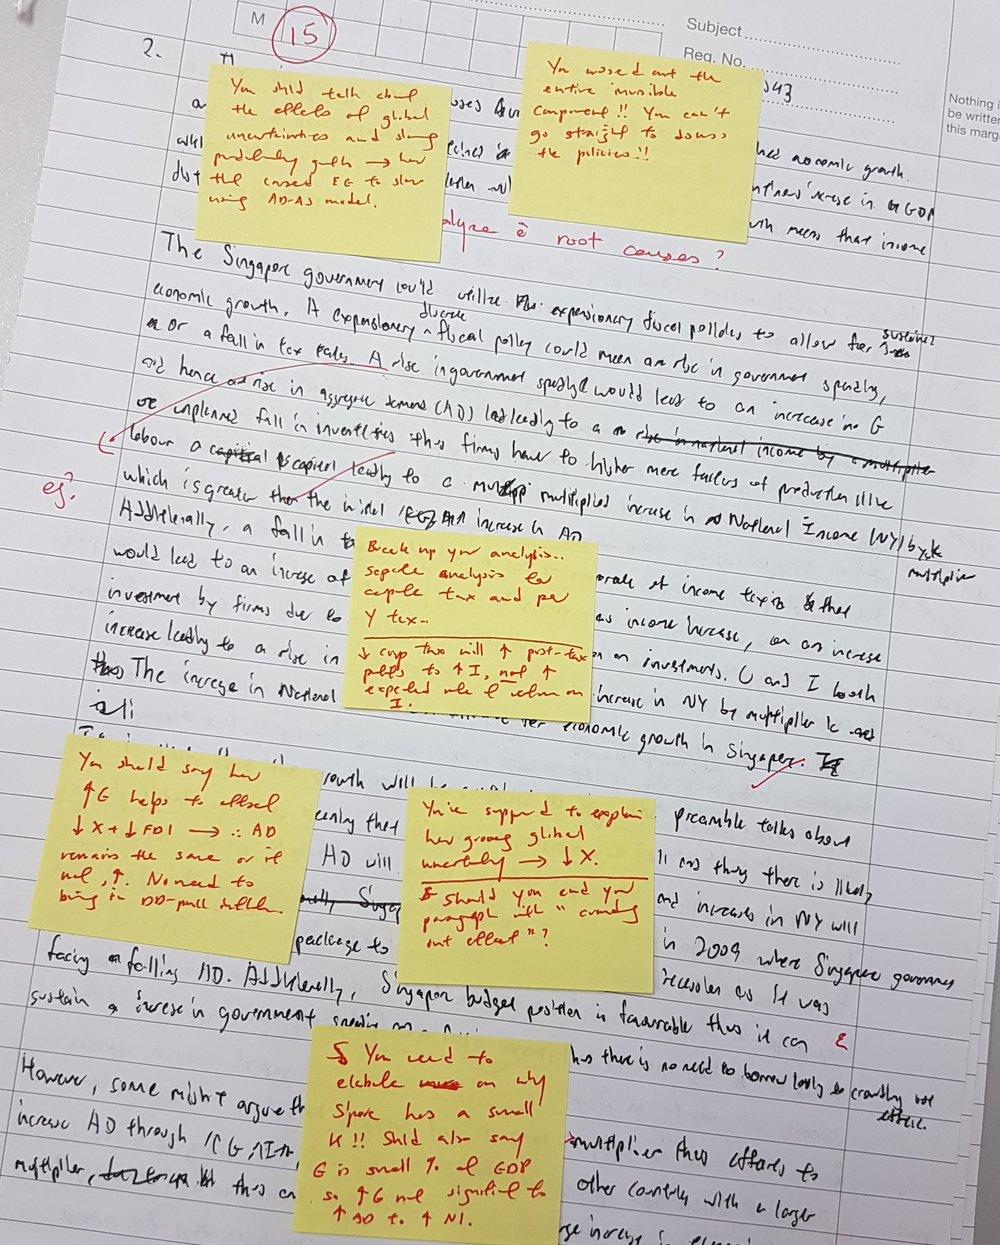 Script review 4.jpg